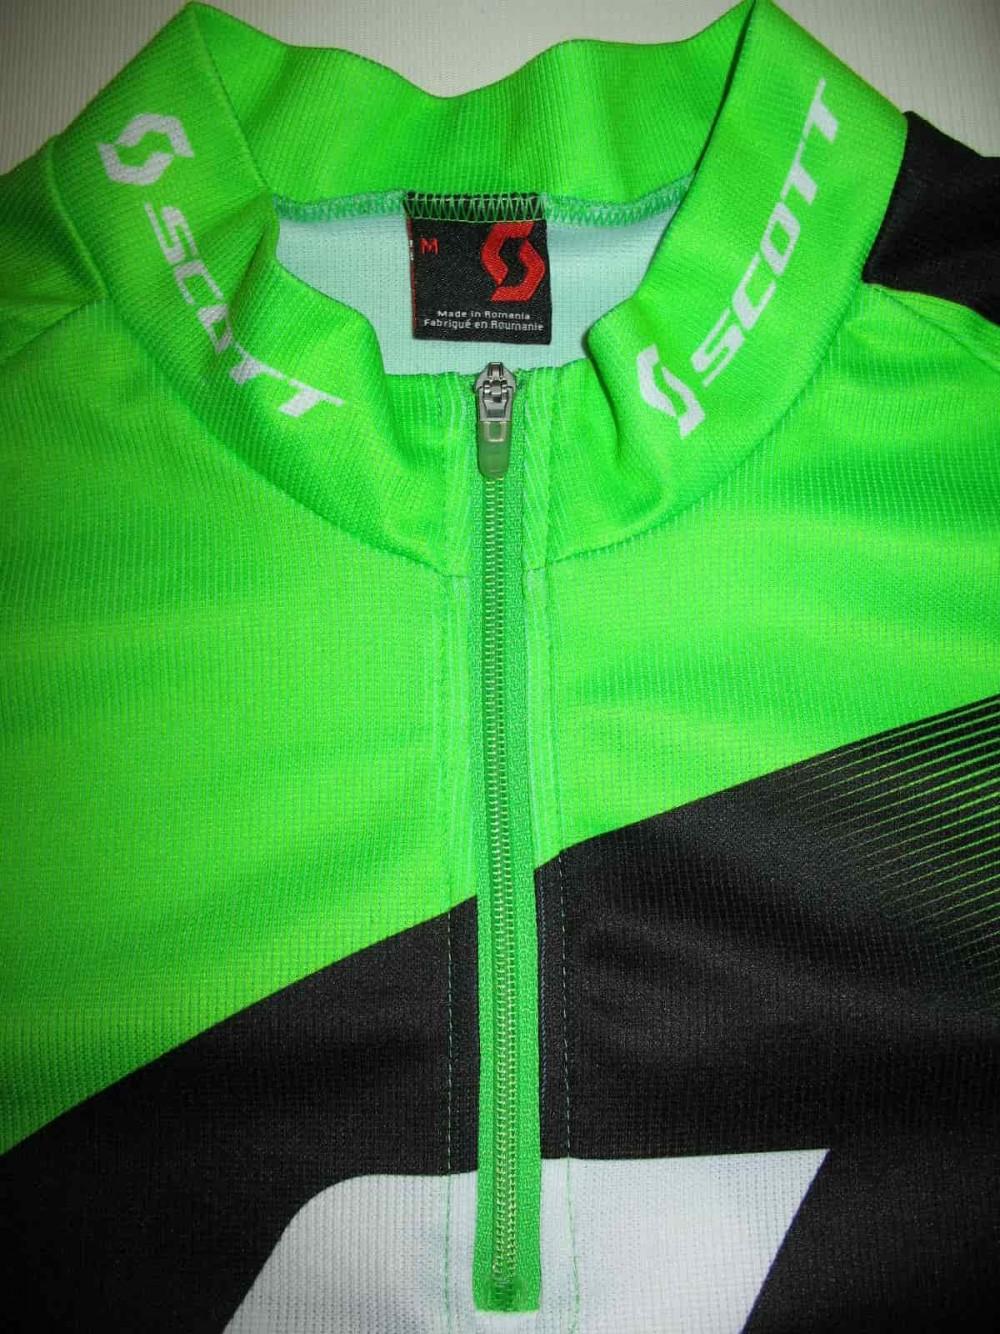 Веломайка SCOTT authentic green cycling jersey (размер M) - 3